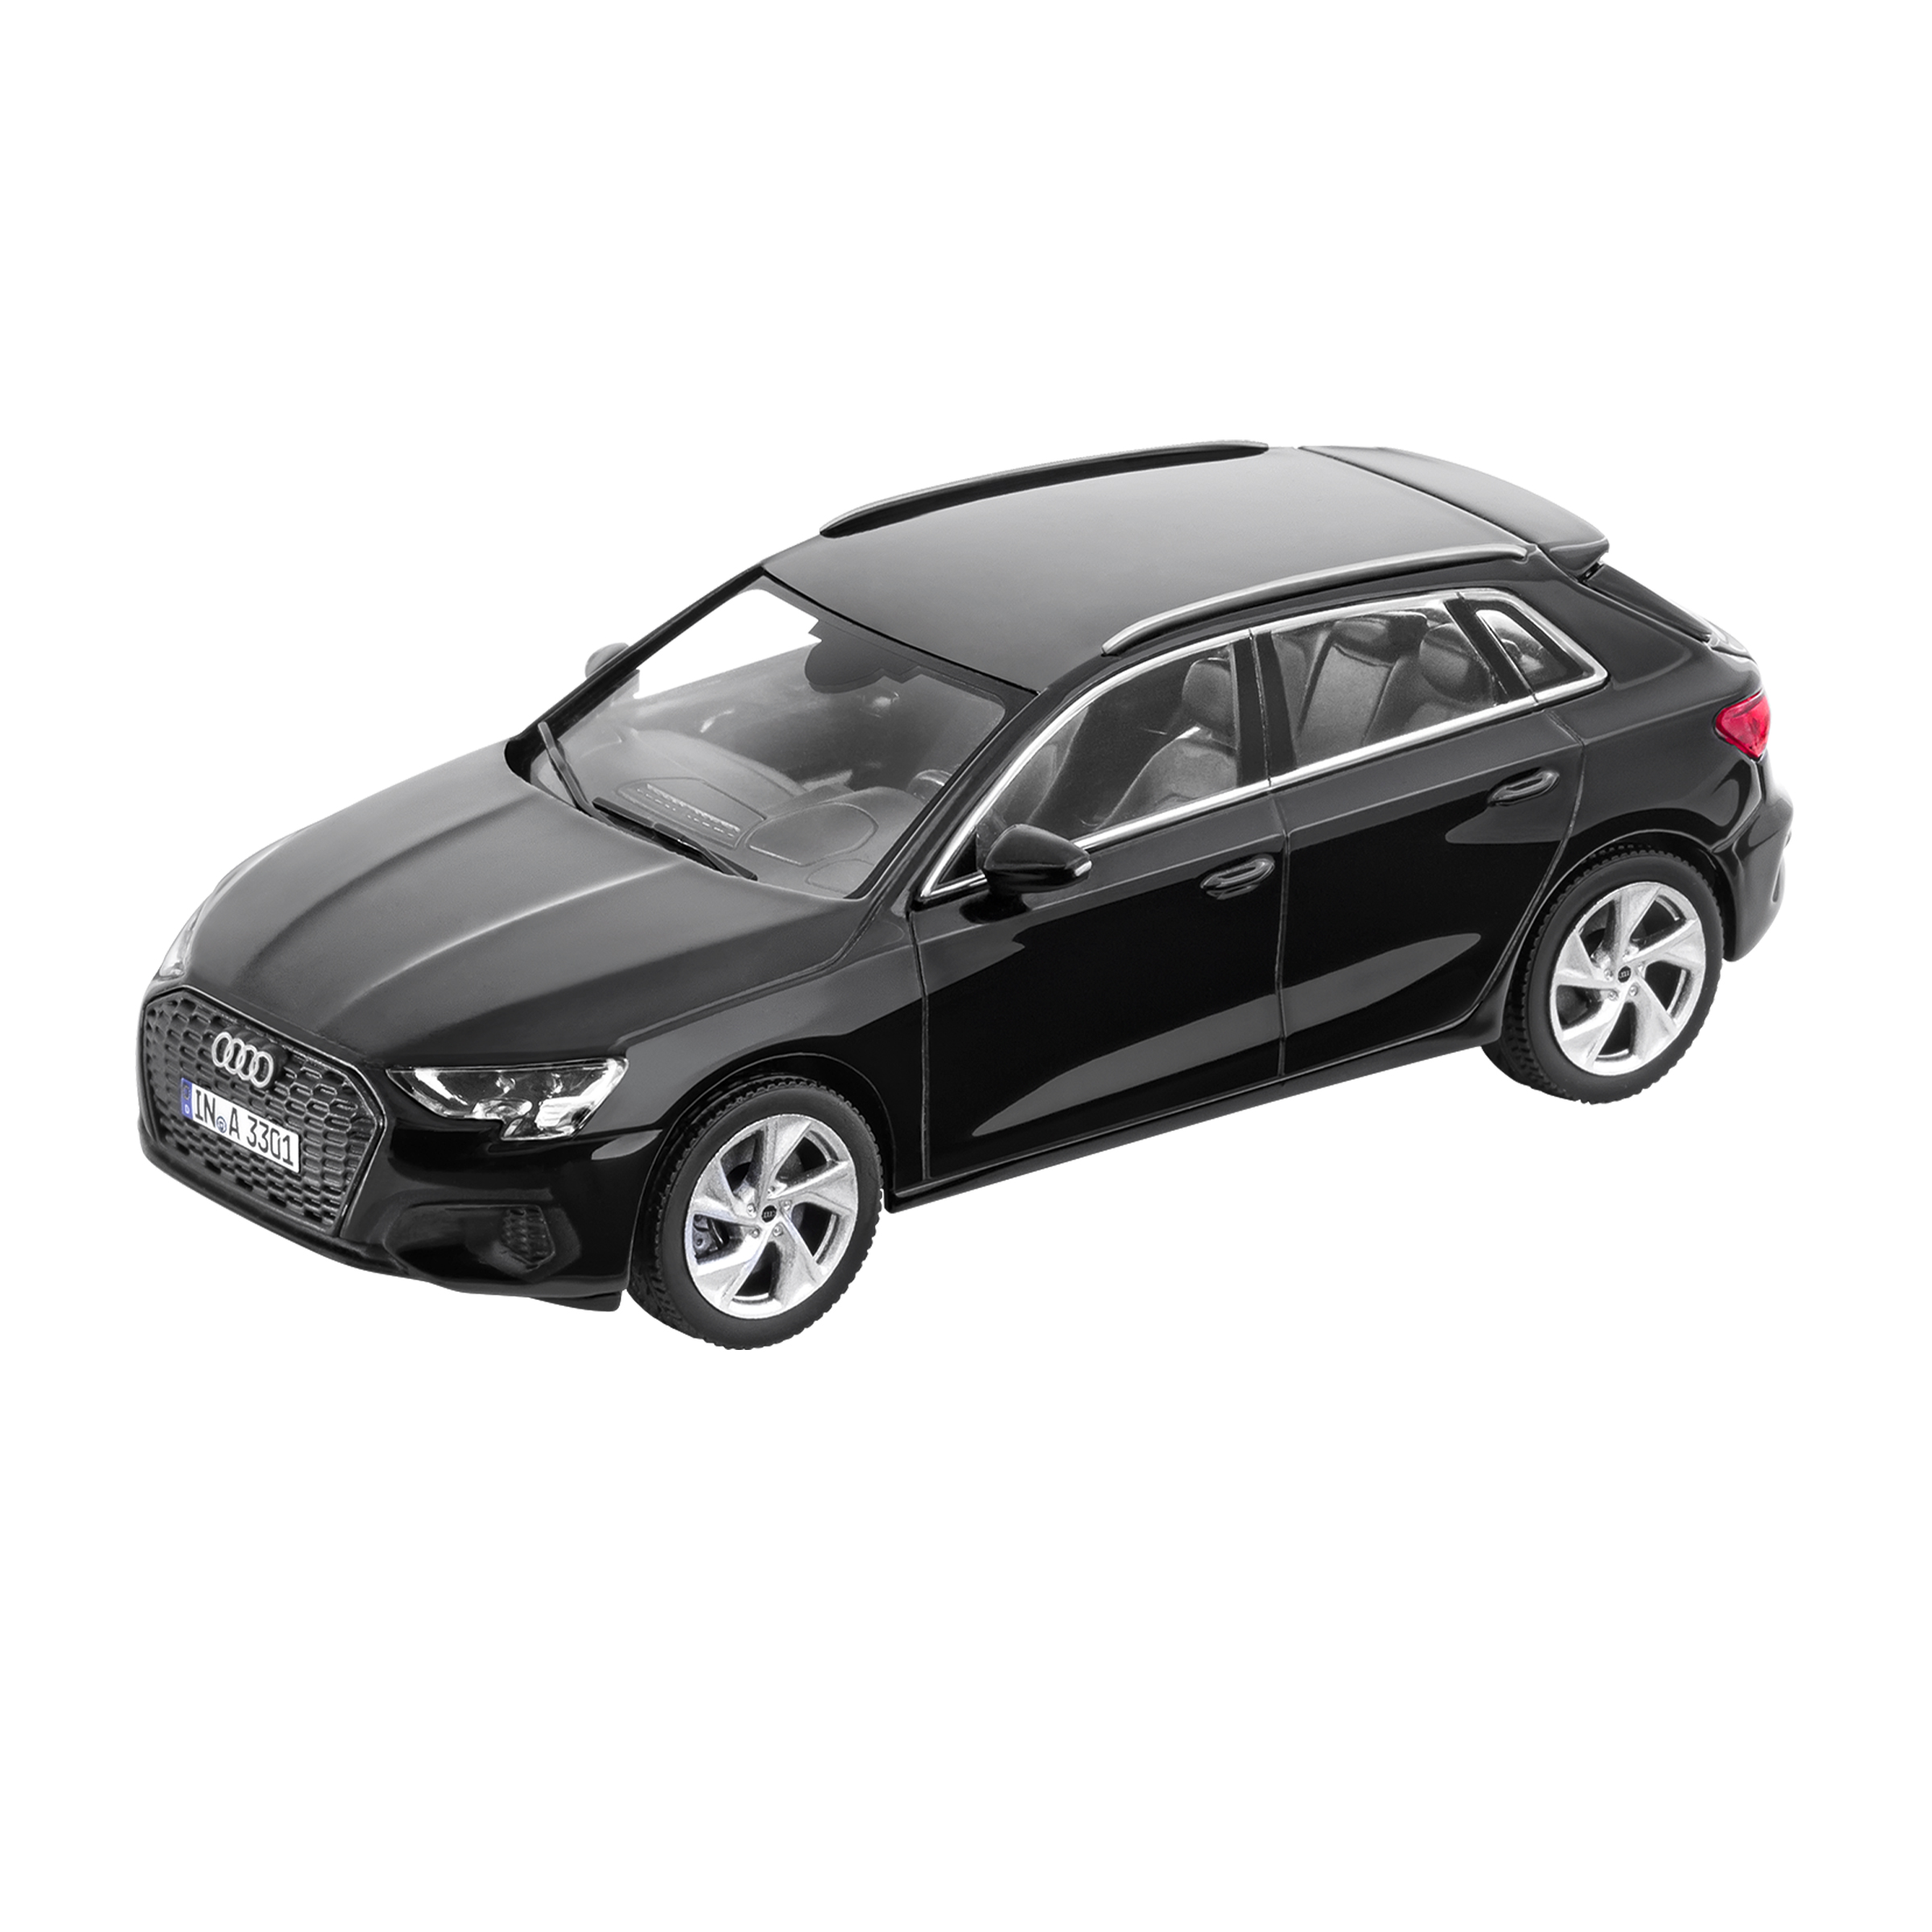 Audi A3 Sportback Mythosschwarz 1:43